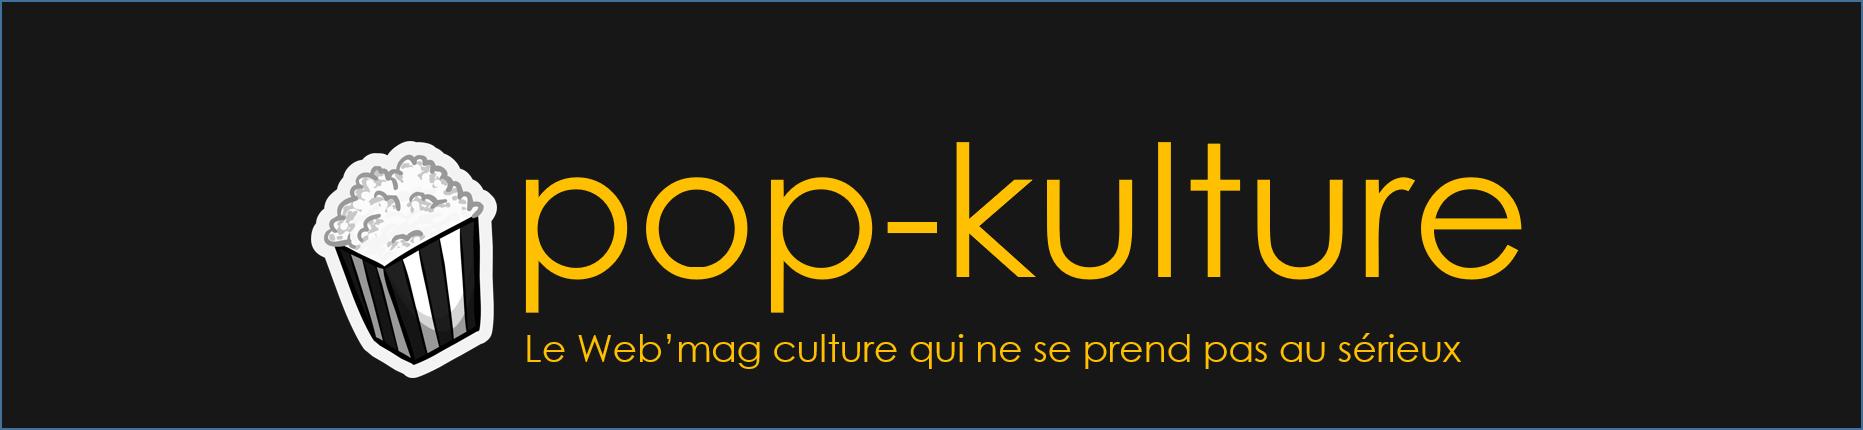 pop-kulture-logo-3